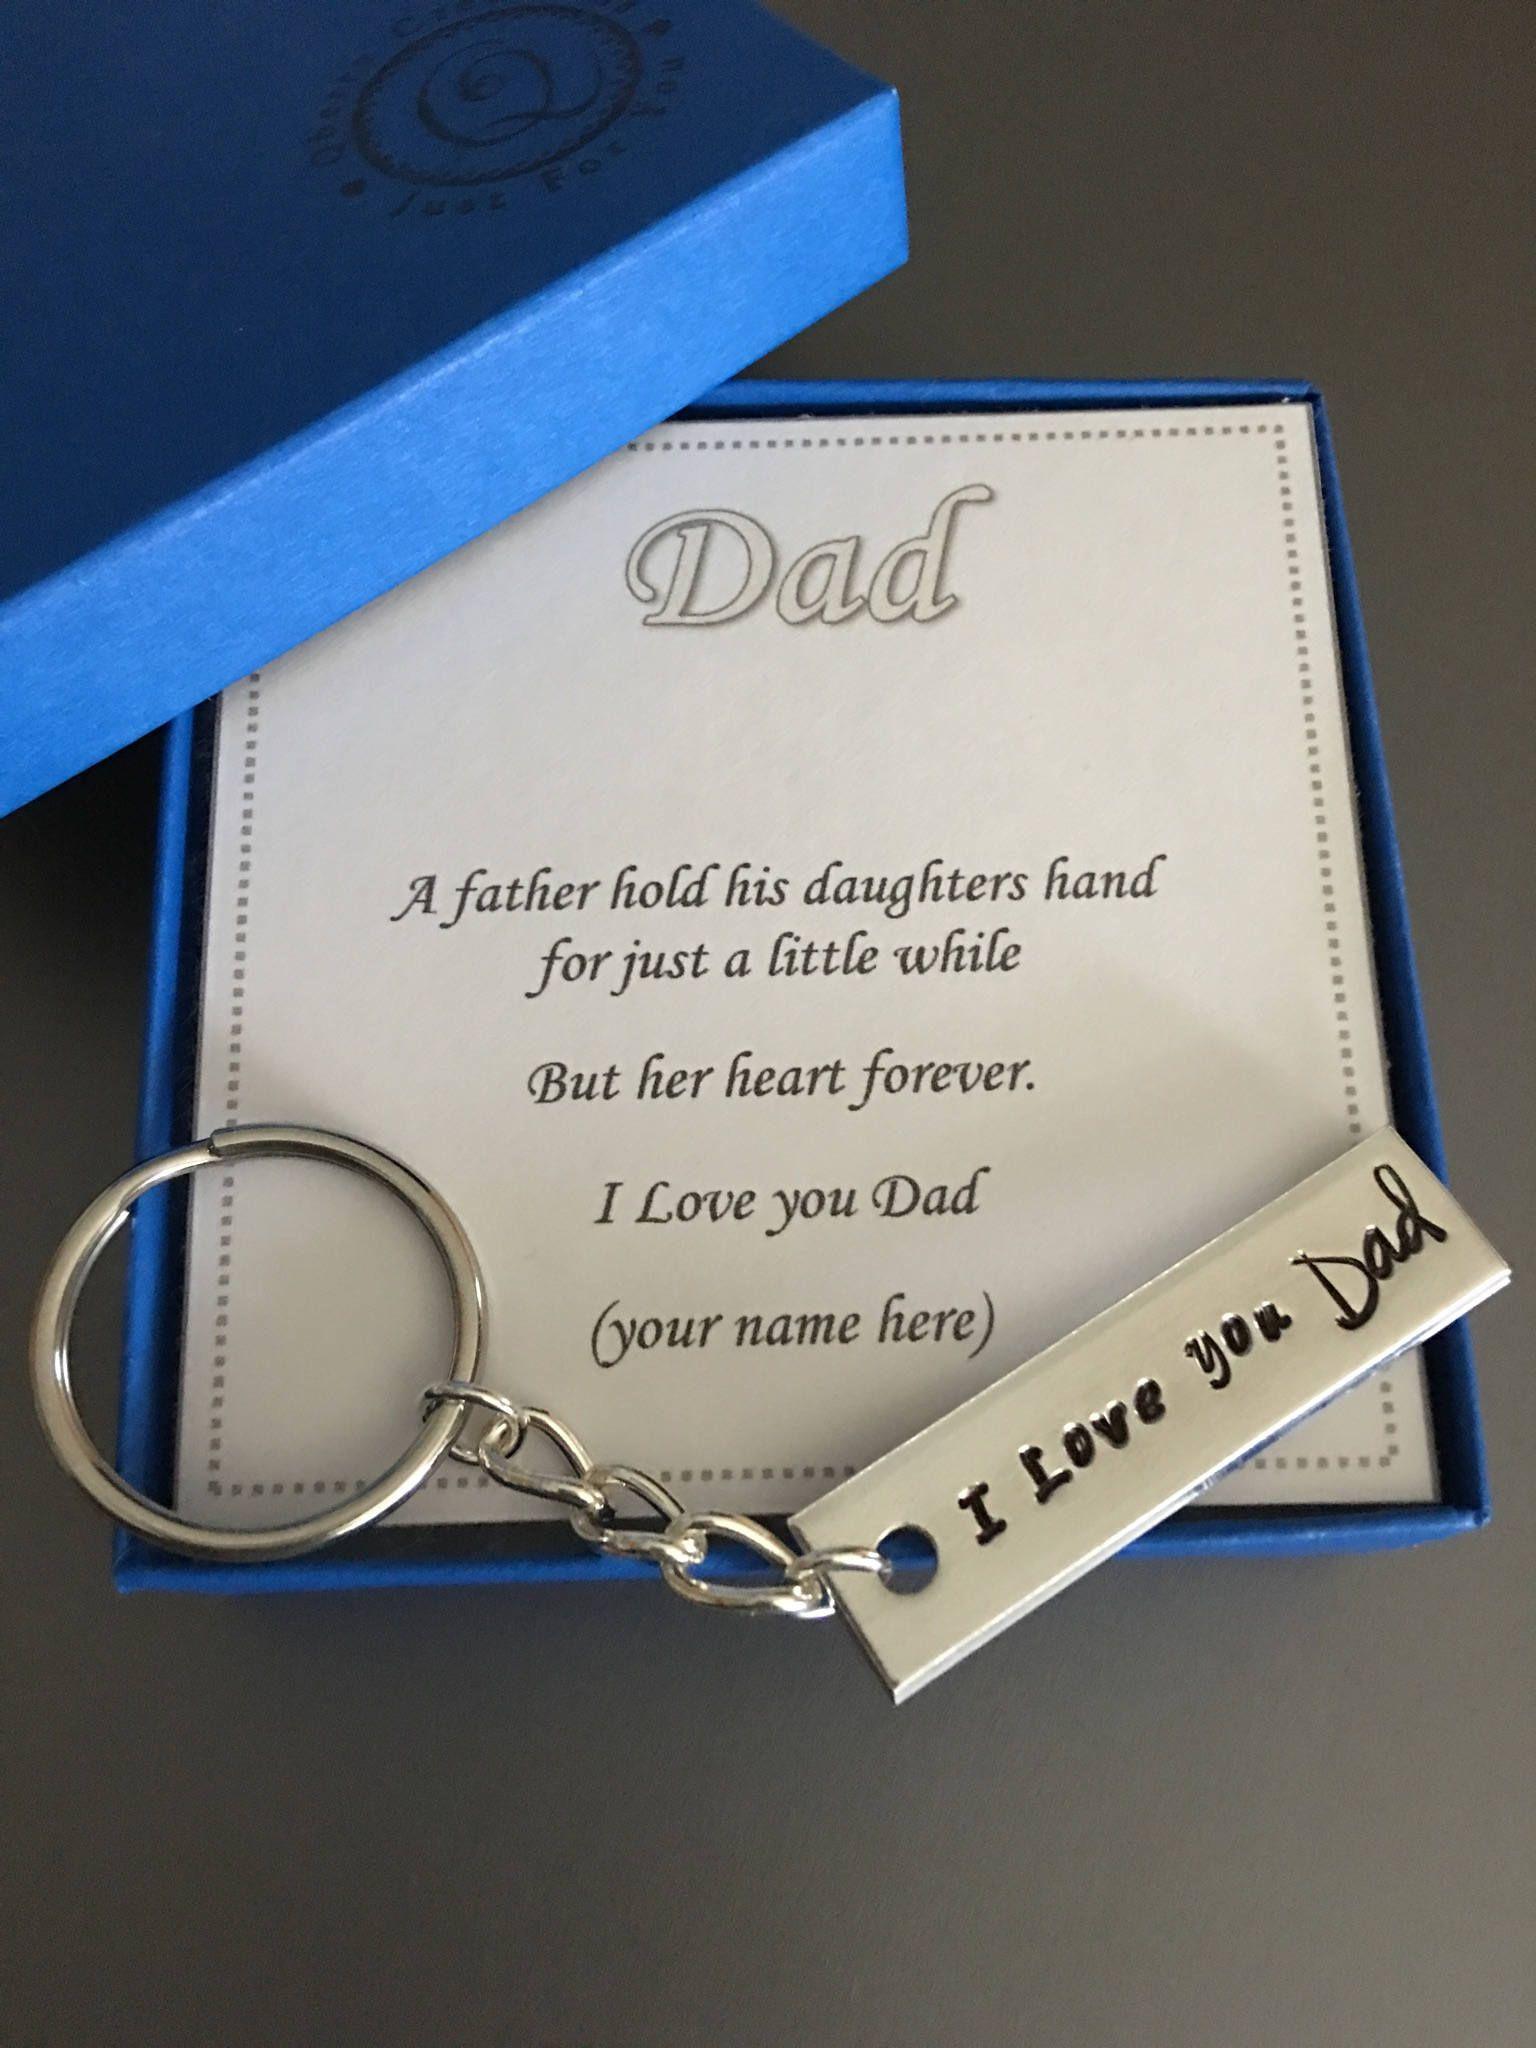 Considerable Dad Photos Styles Ideas 2018 Far Far S Day Gift Fars Groom Present Ideas Far Bride Keychain Wedding Gift Gift To Wedding Gift Groom Gifts Amazon